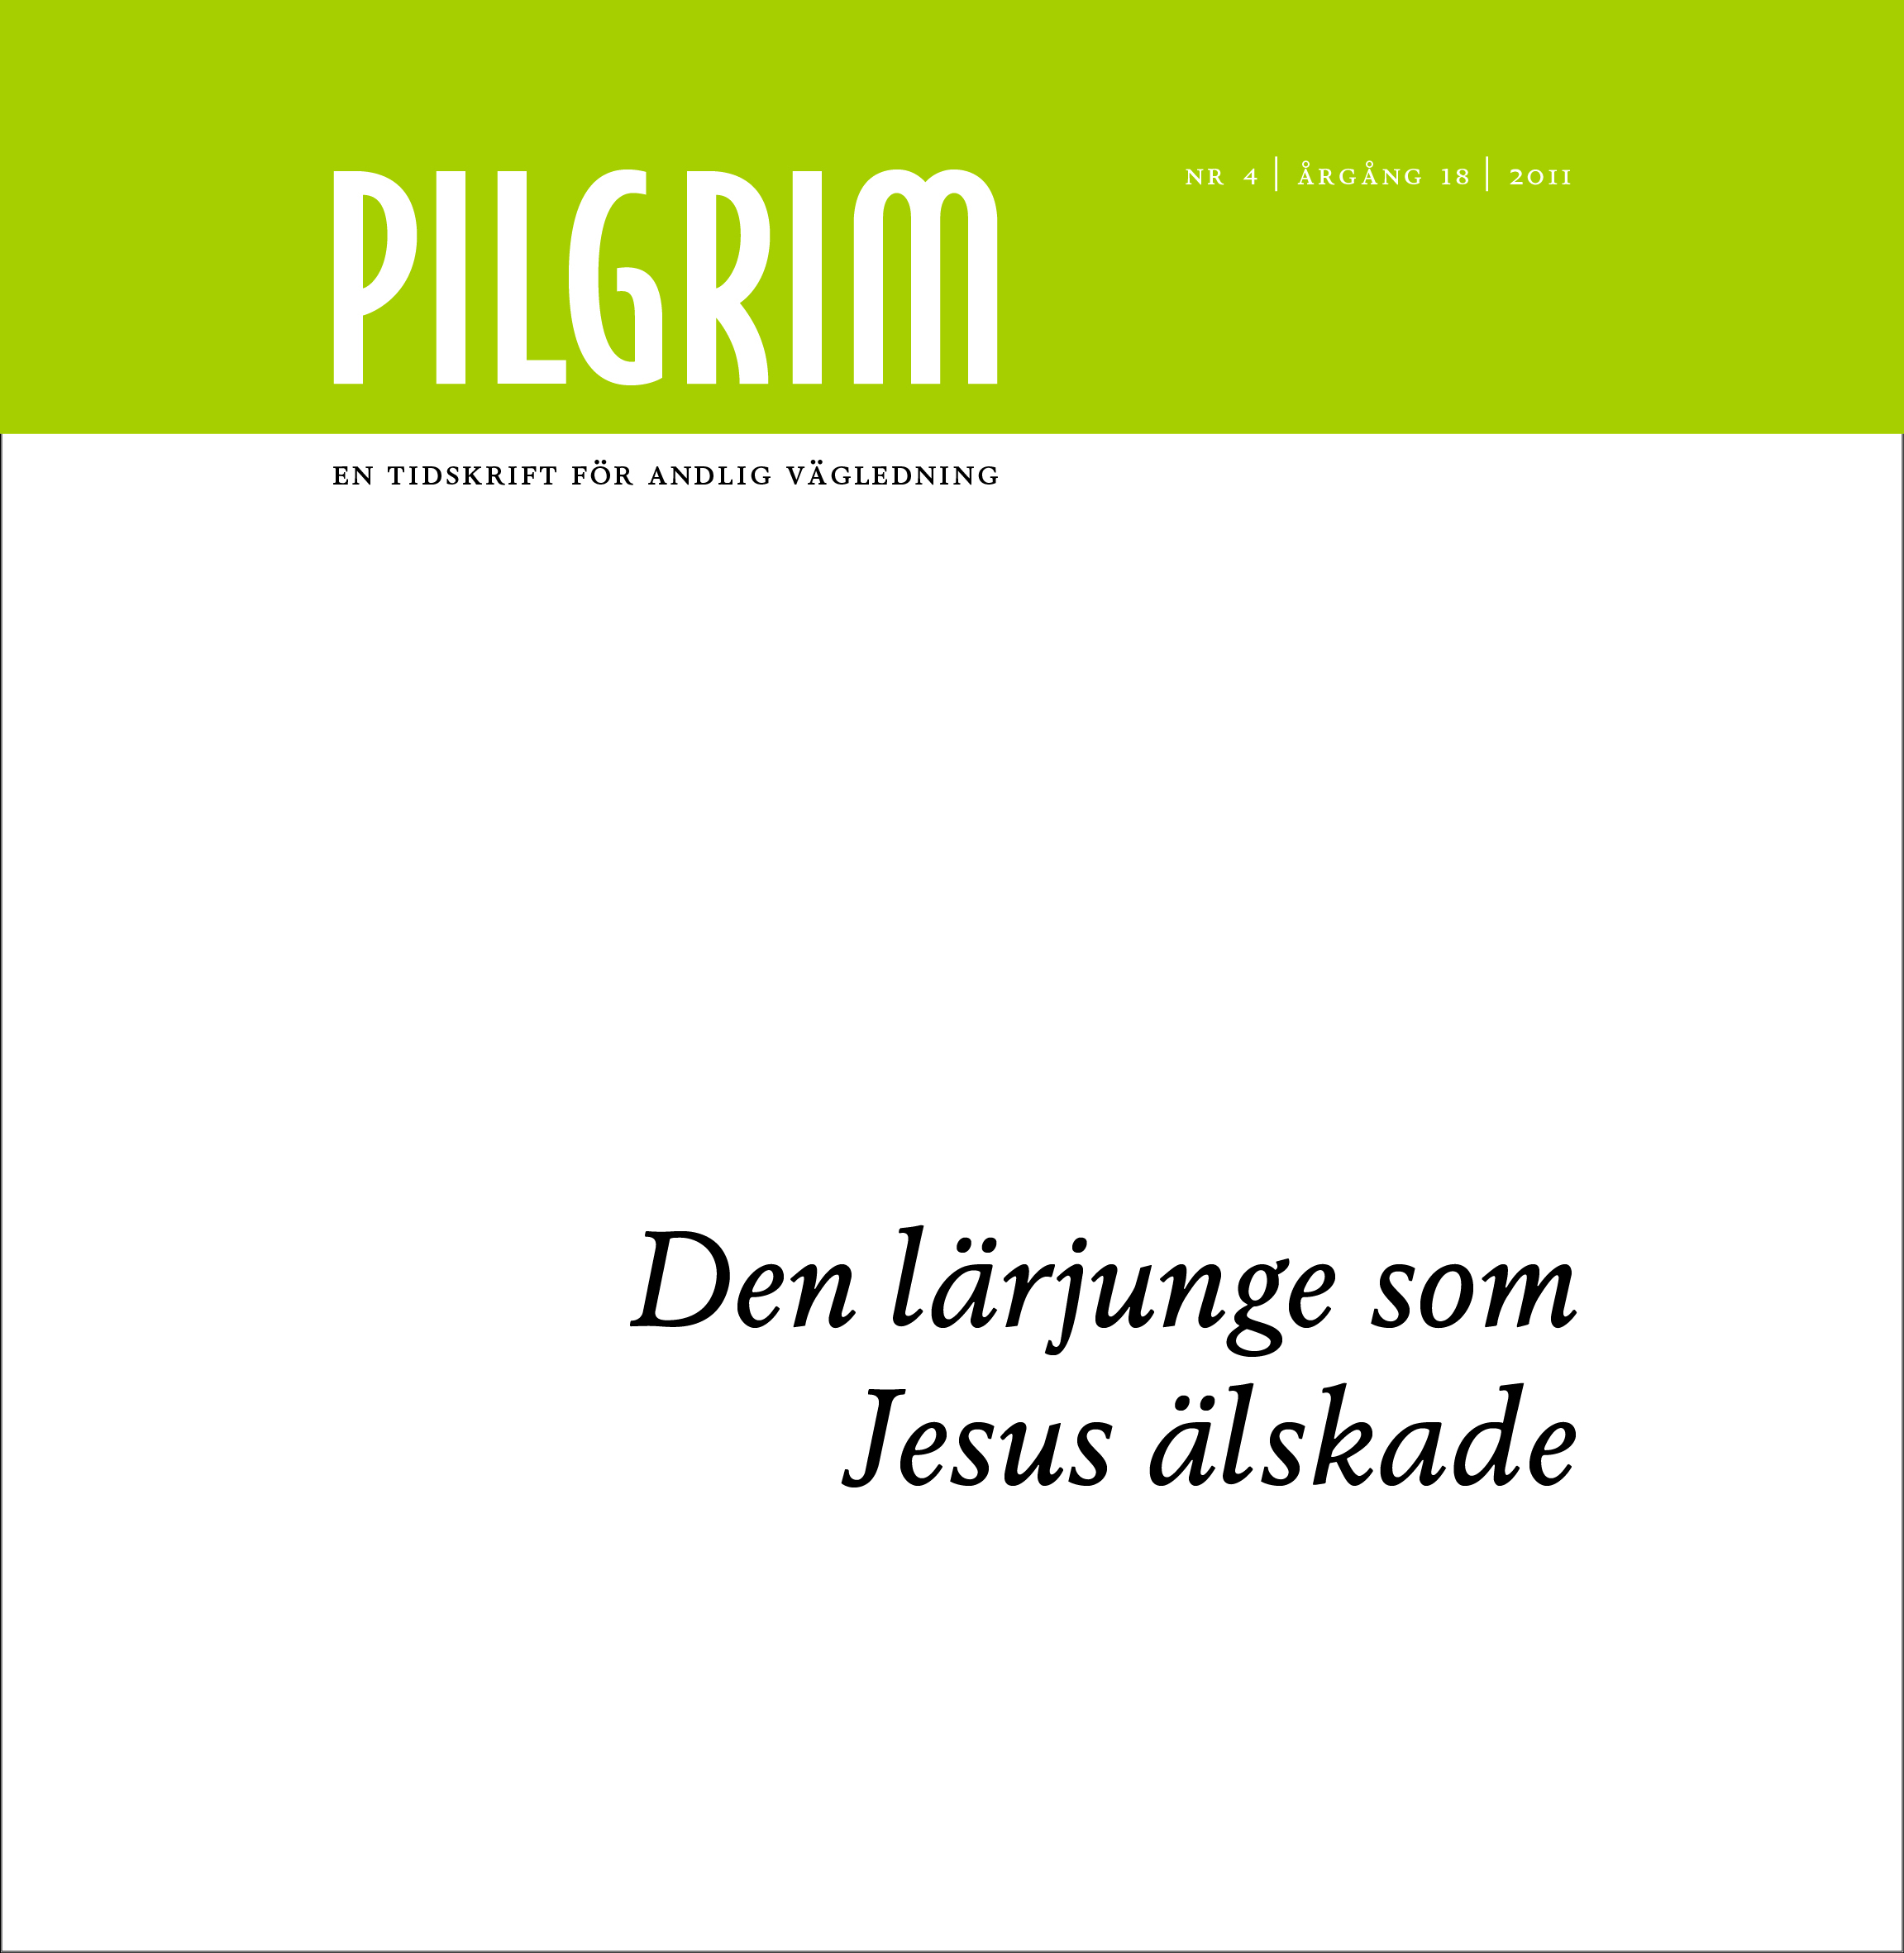 Pilgrim frams 2011-4